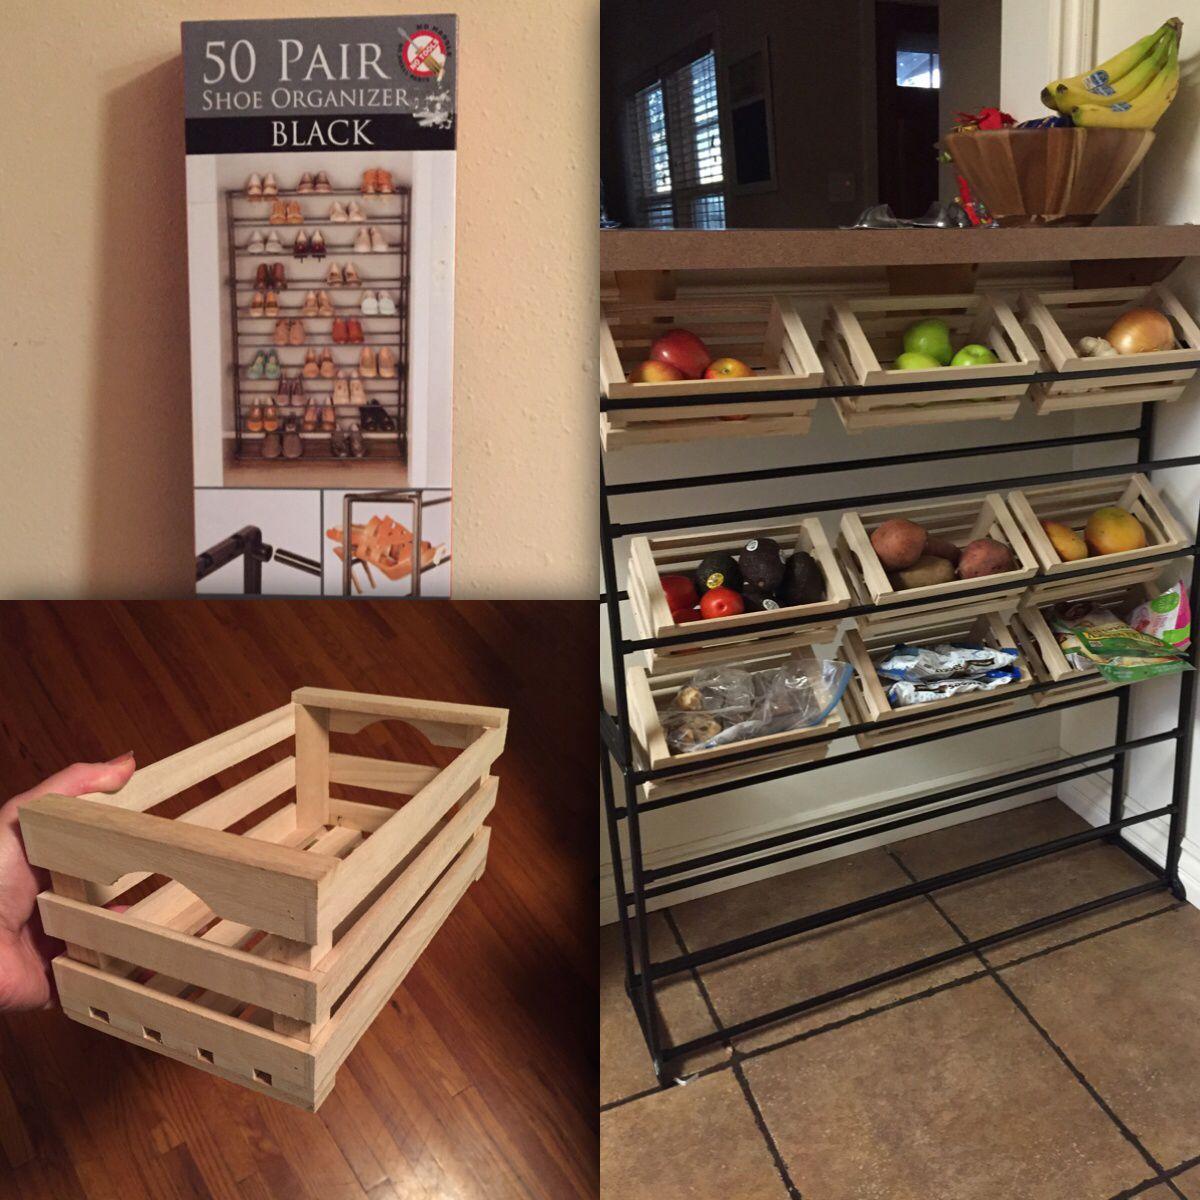 Kitchenstorage hack shoe rack mini crates